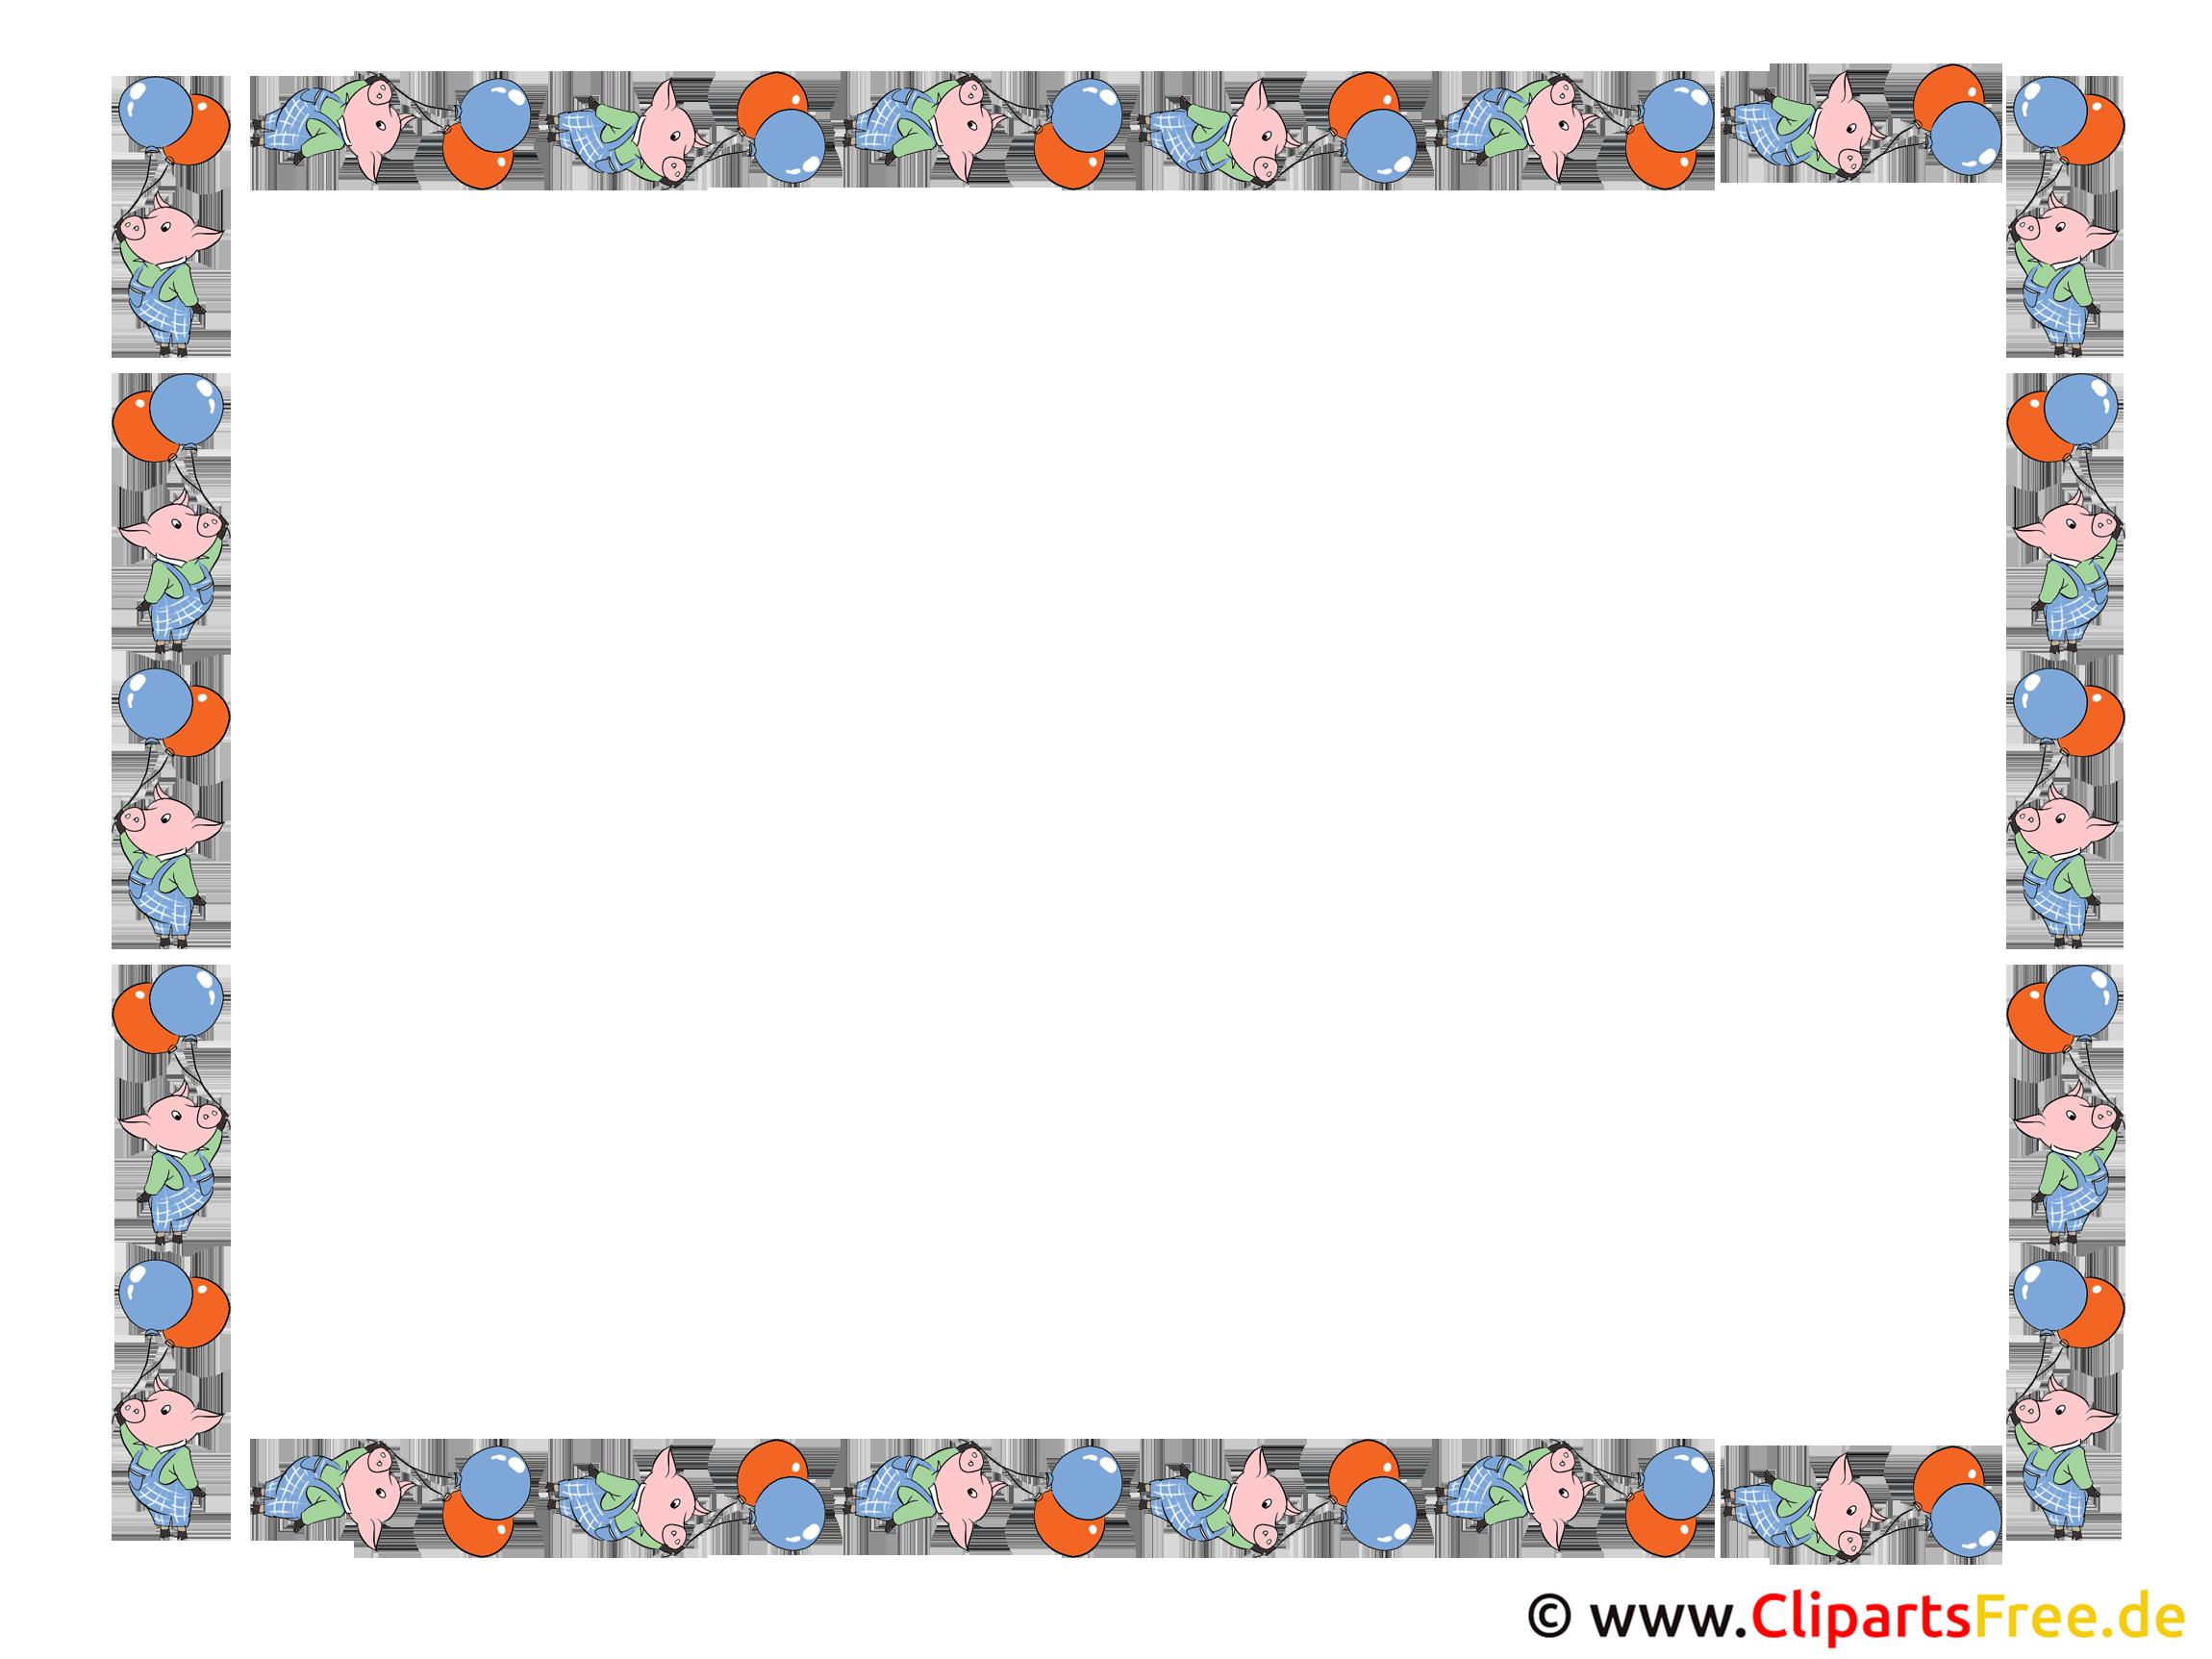 Rahmen Clipart kostenlos download